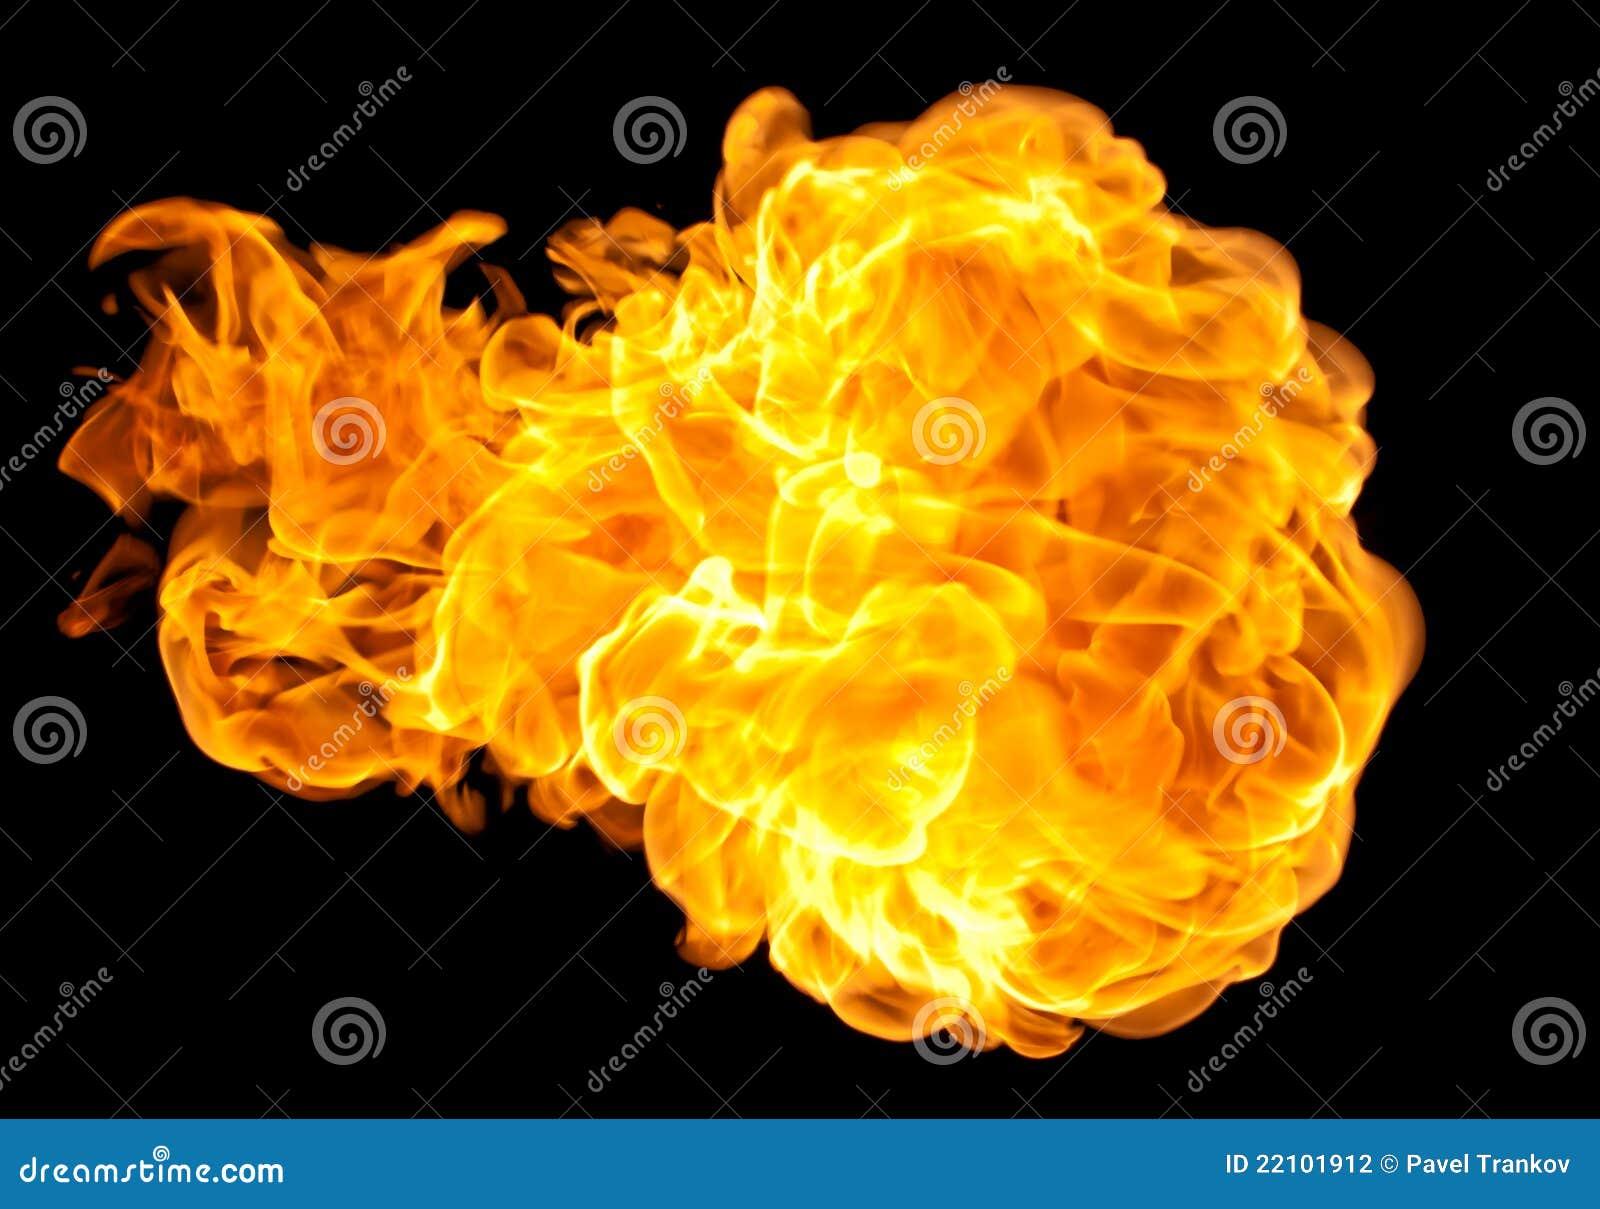 Flying fire ball